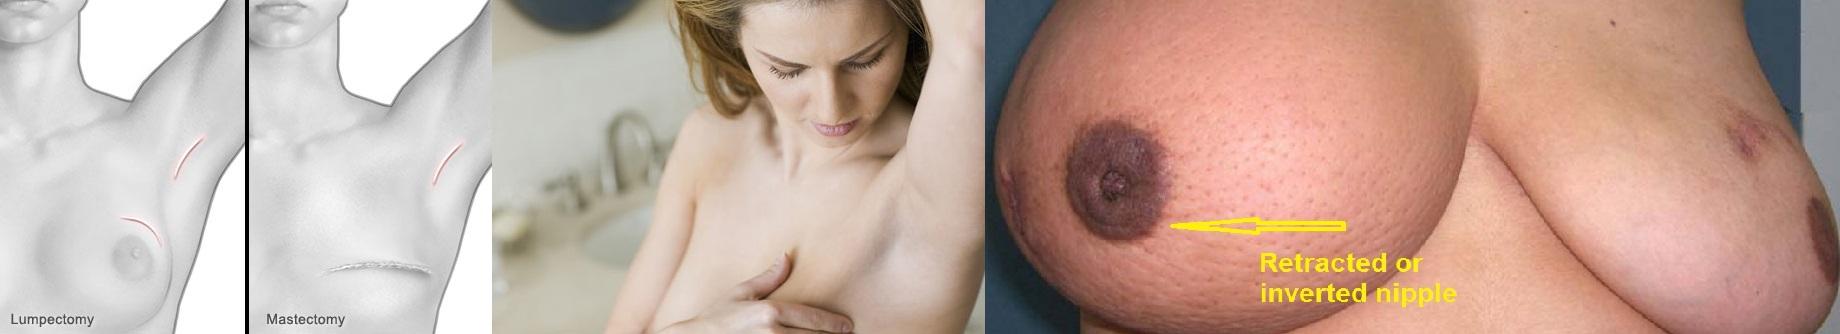 Lumpectomy and Mastectomy 1